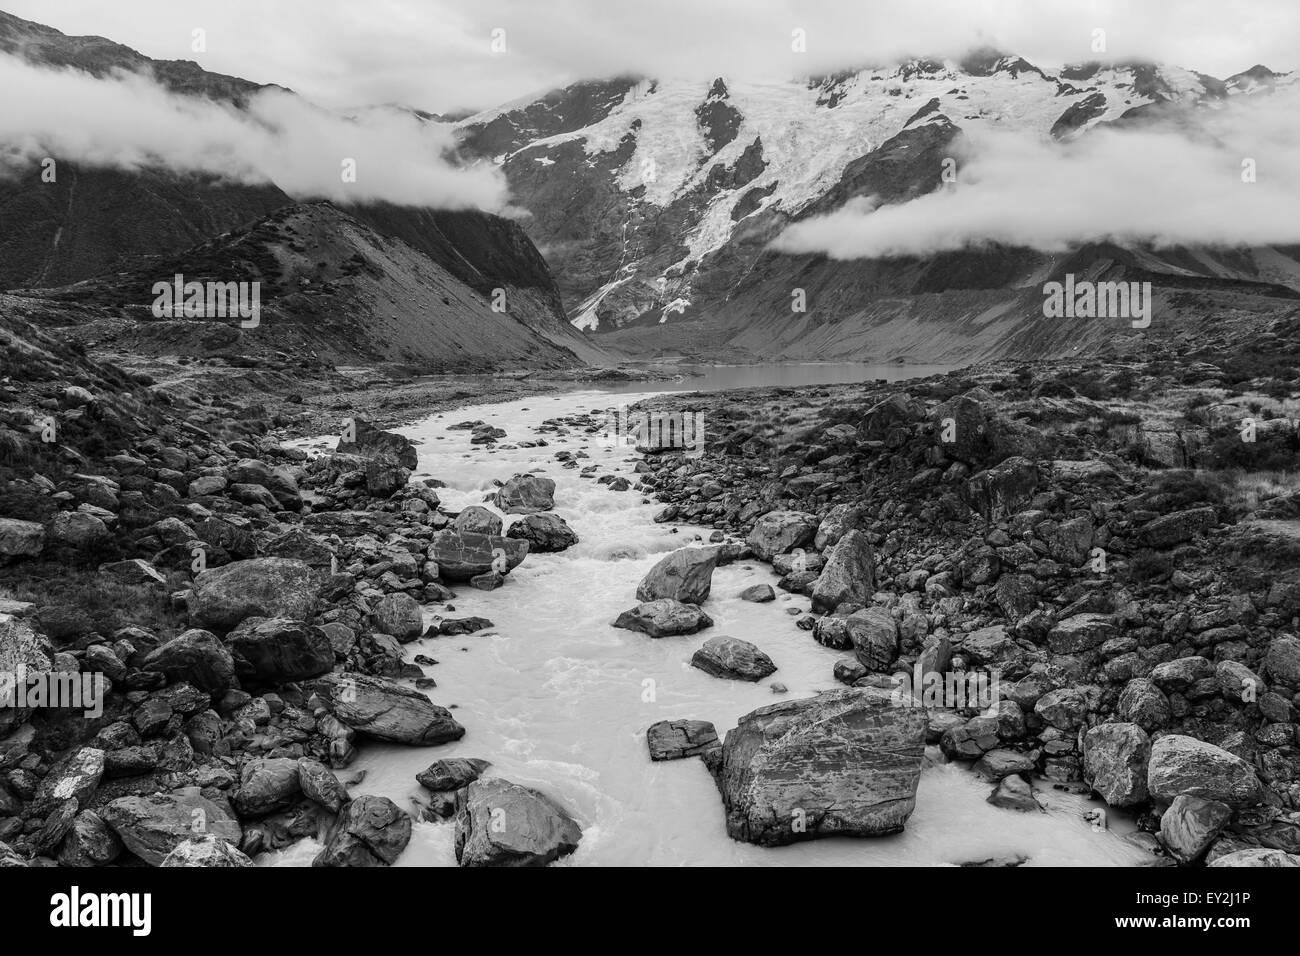 stunning landscapes - Stock Image